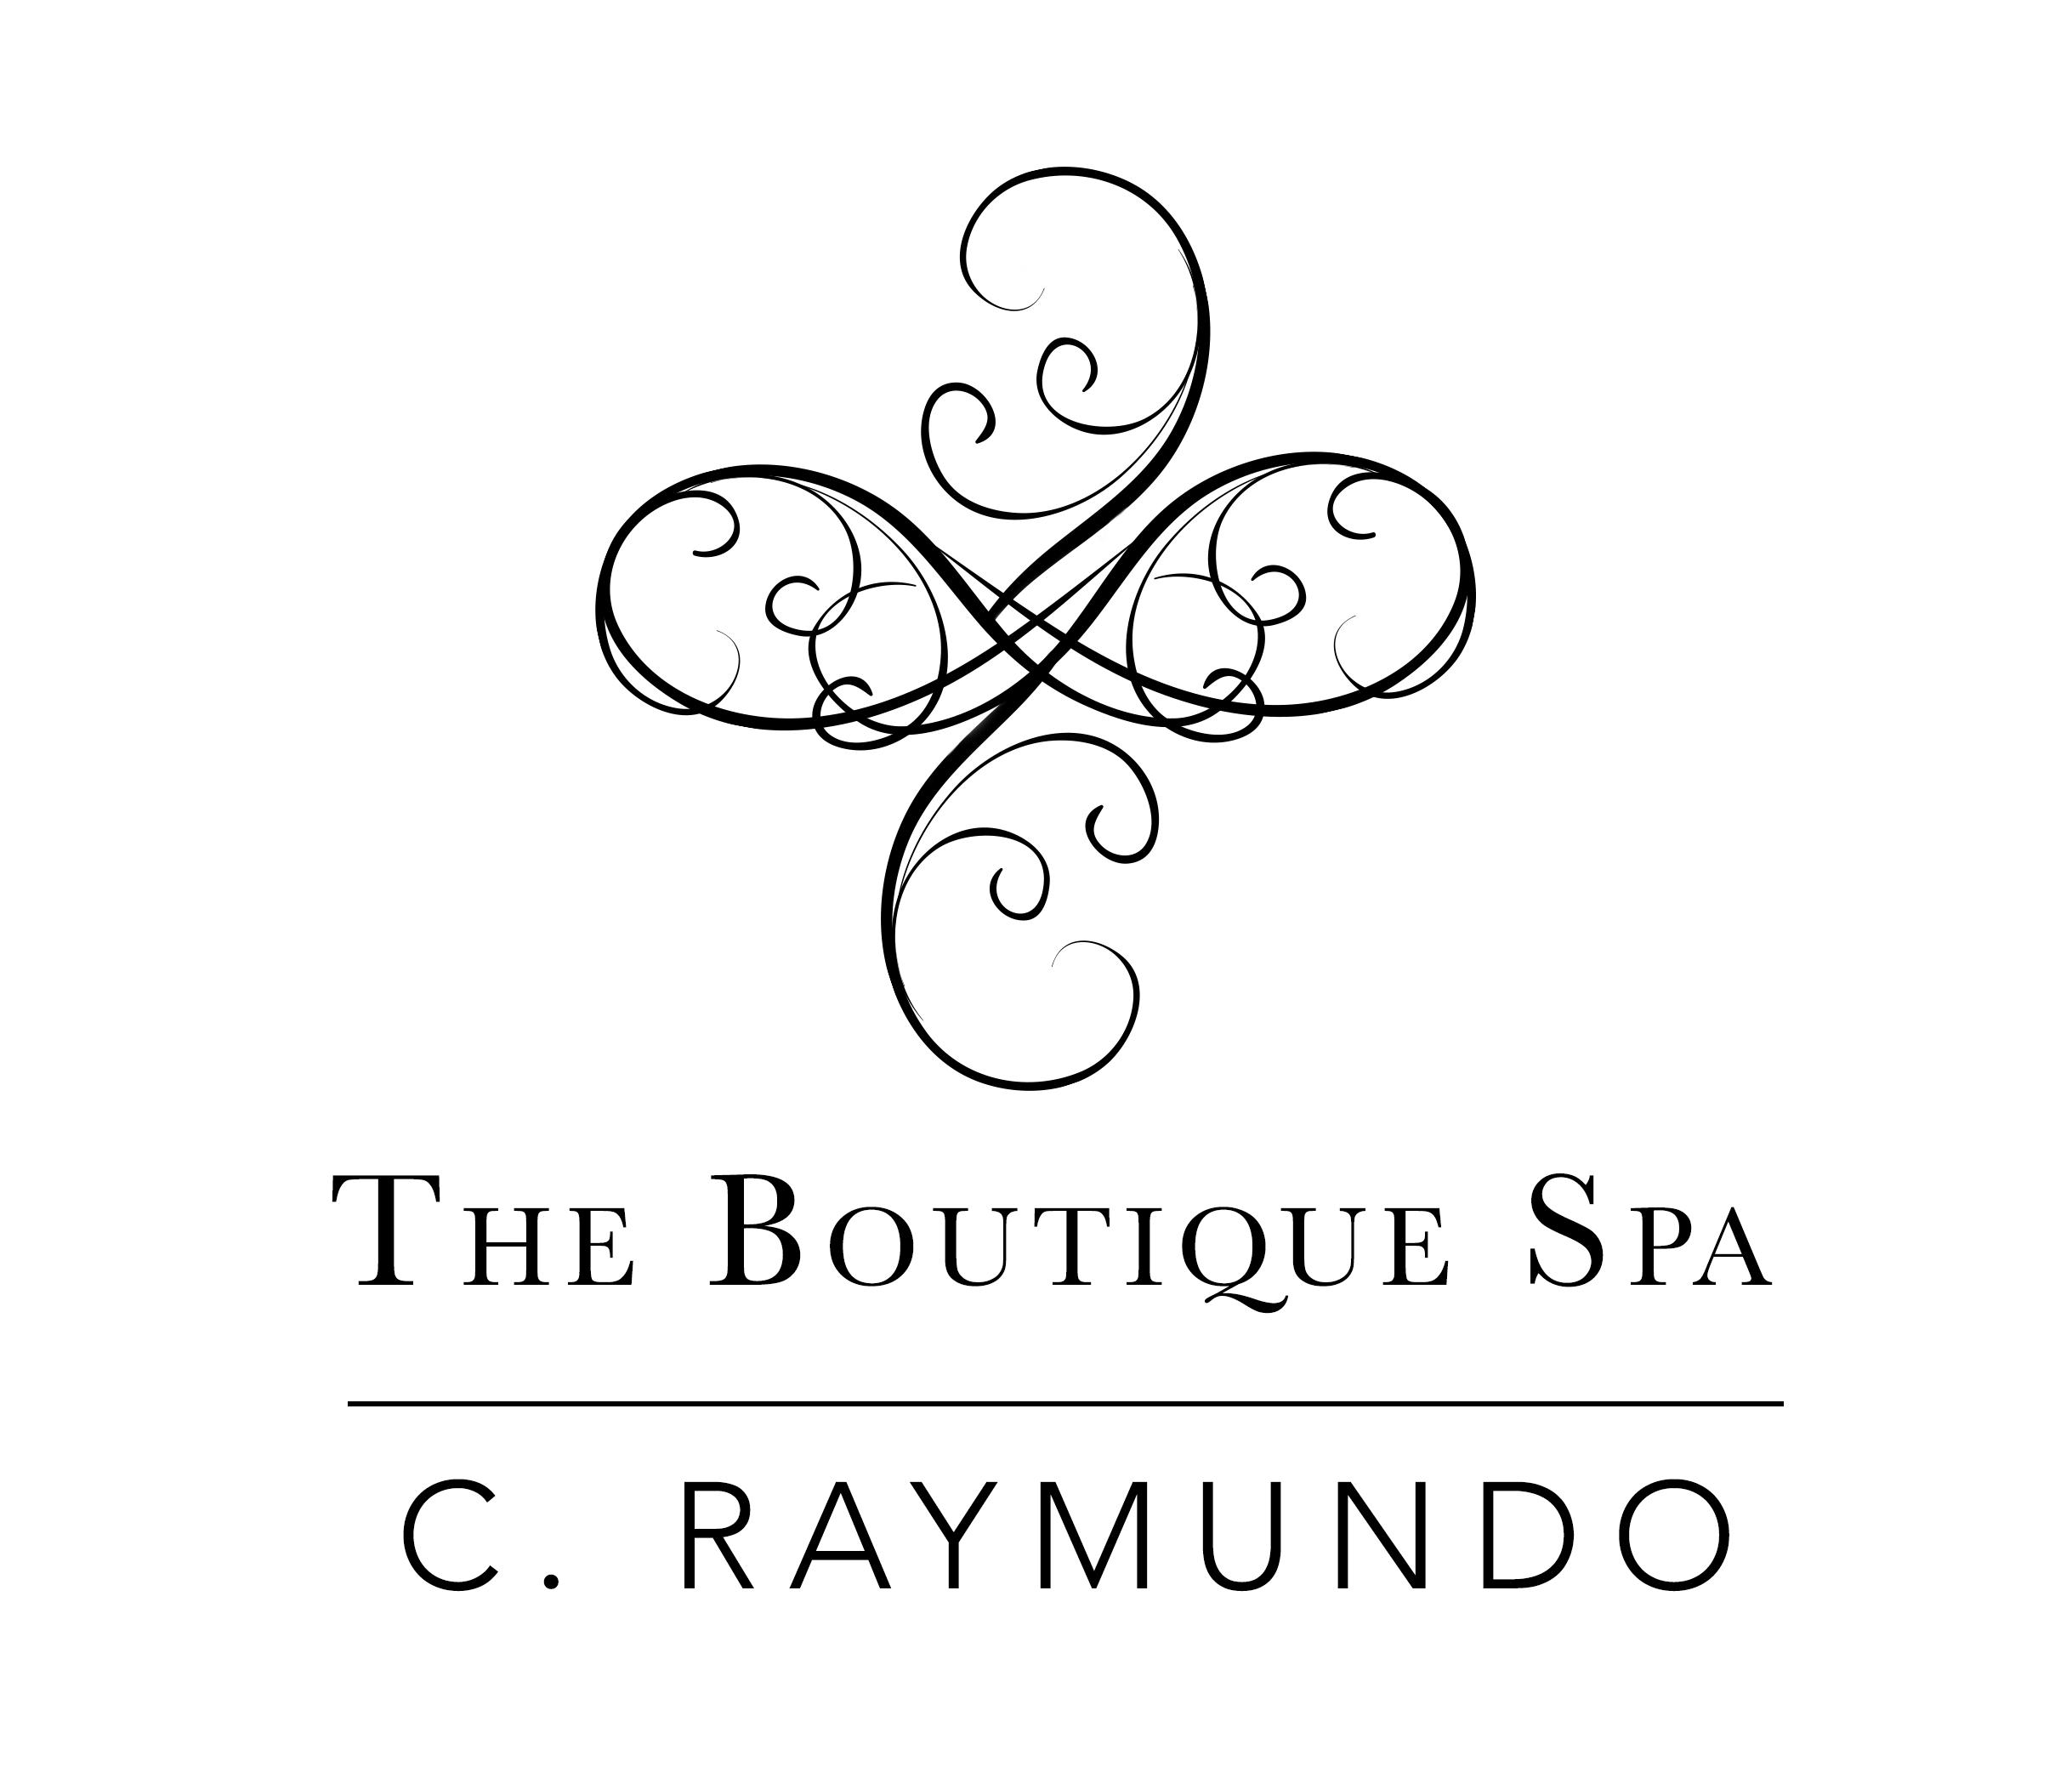 The Boutique Spa